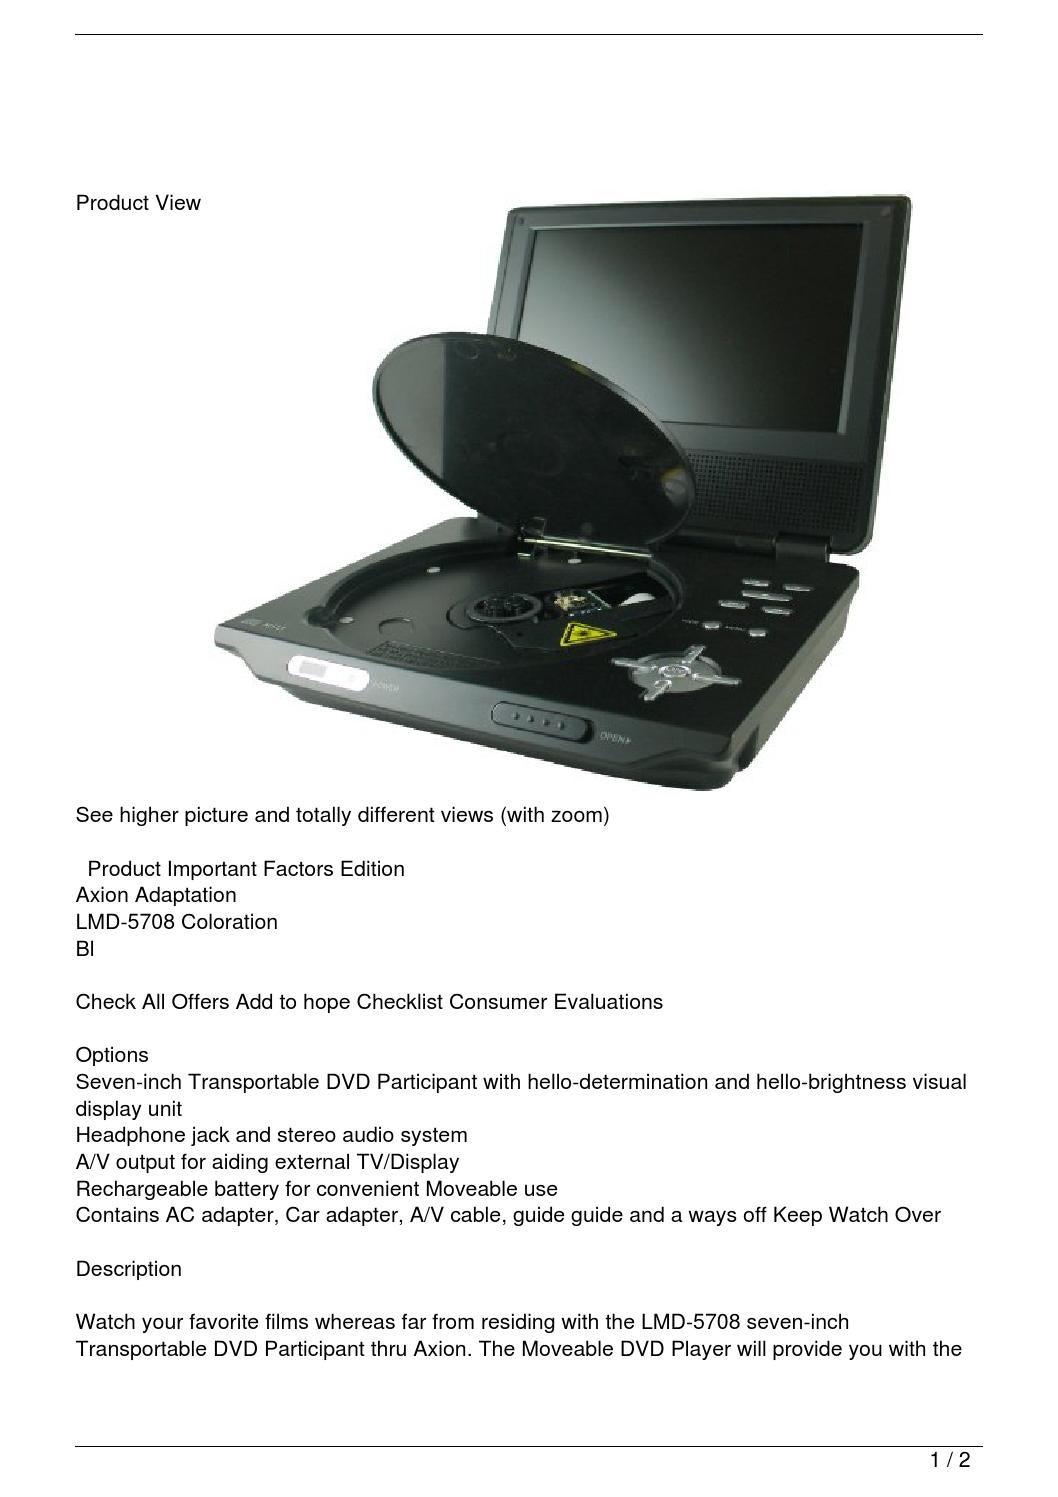 axion portable dvd player manual